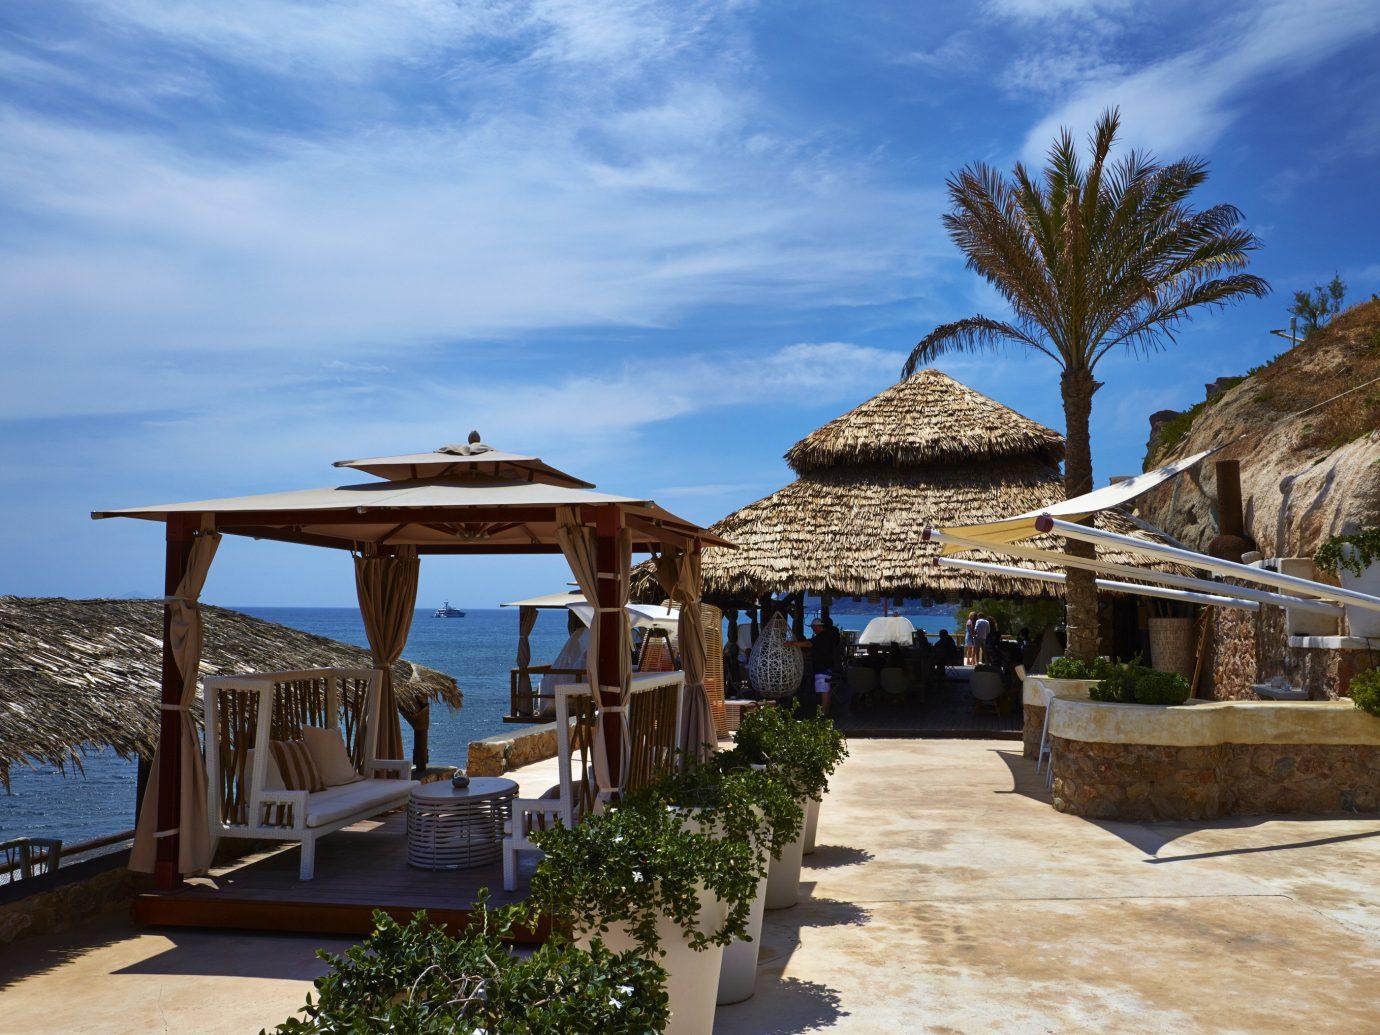 Trip Ideas sky outdoor Resort arecales palm tree Sea tree tropics vacation tourism Villa estate real estate Coast plant hacienda leisure water outdoor structure Beach stone